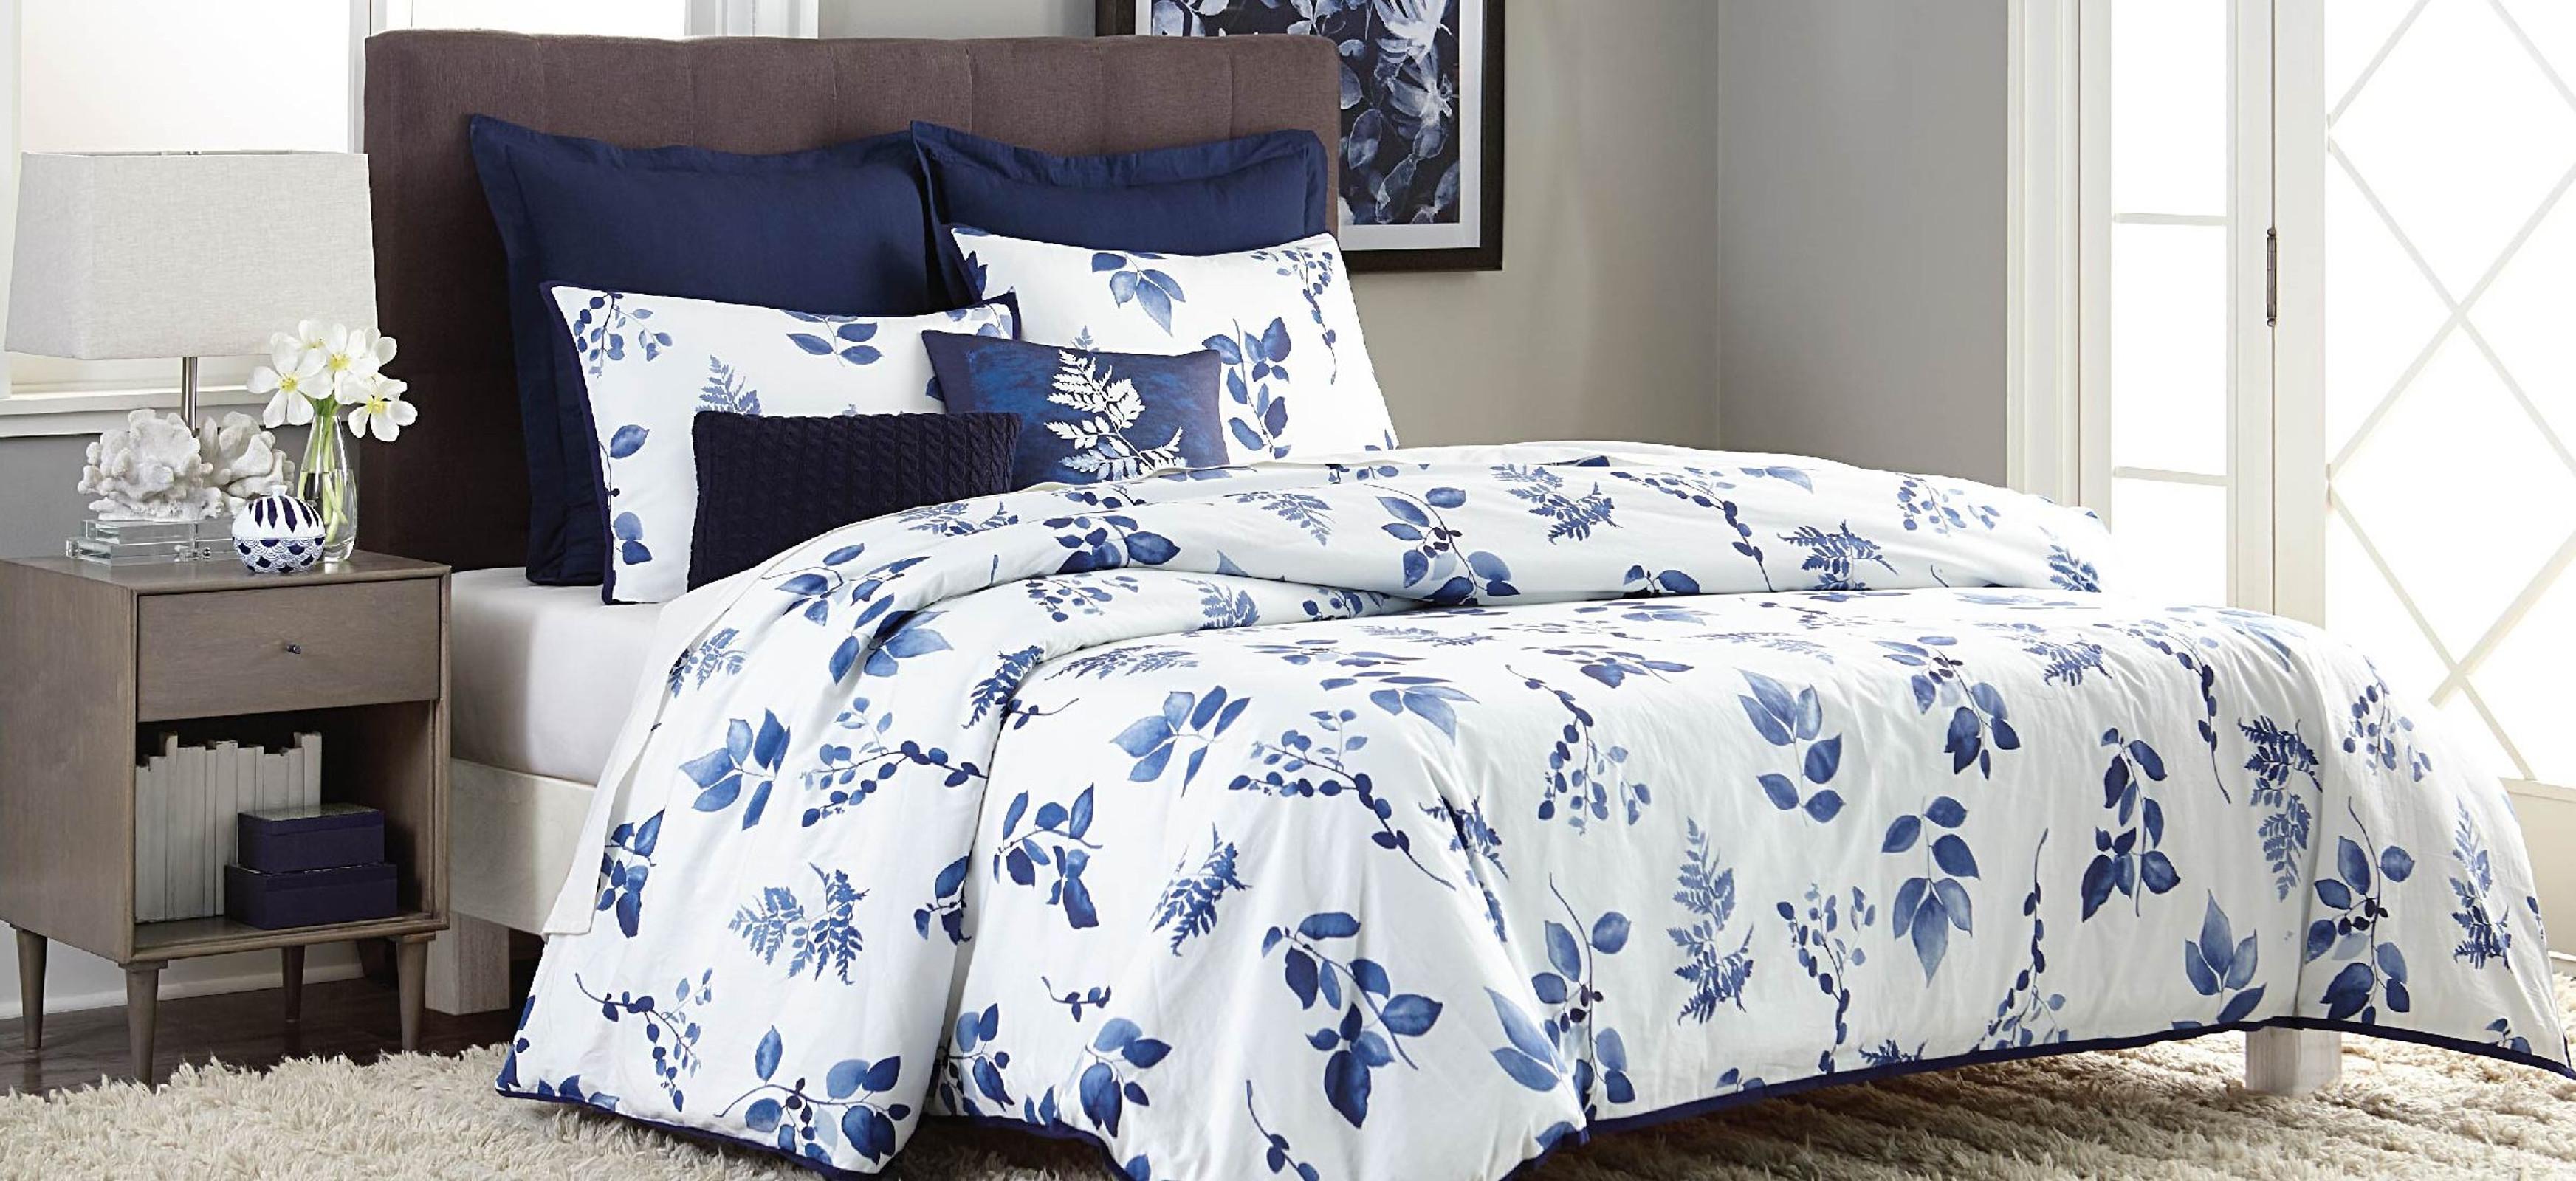 Image of Metaphor 5pc Indigo Comforter Set - Botanical, Blue Indigo